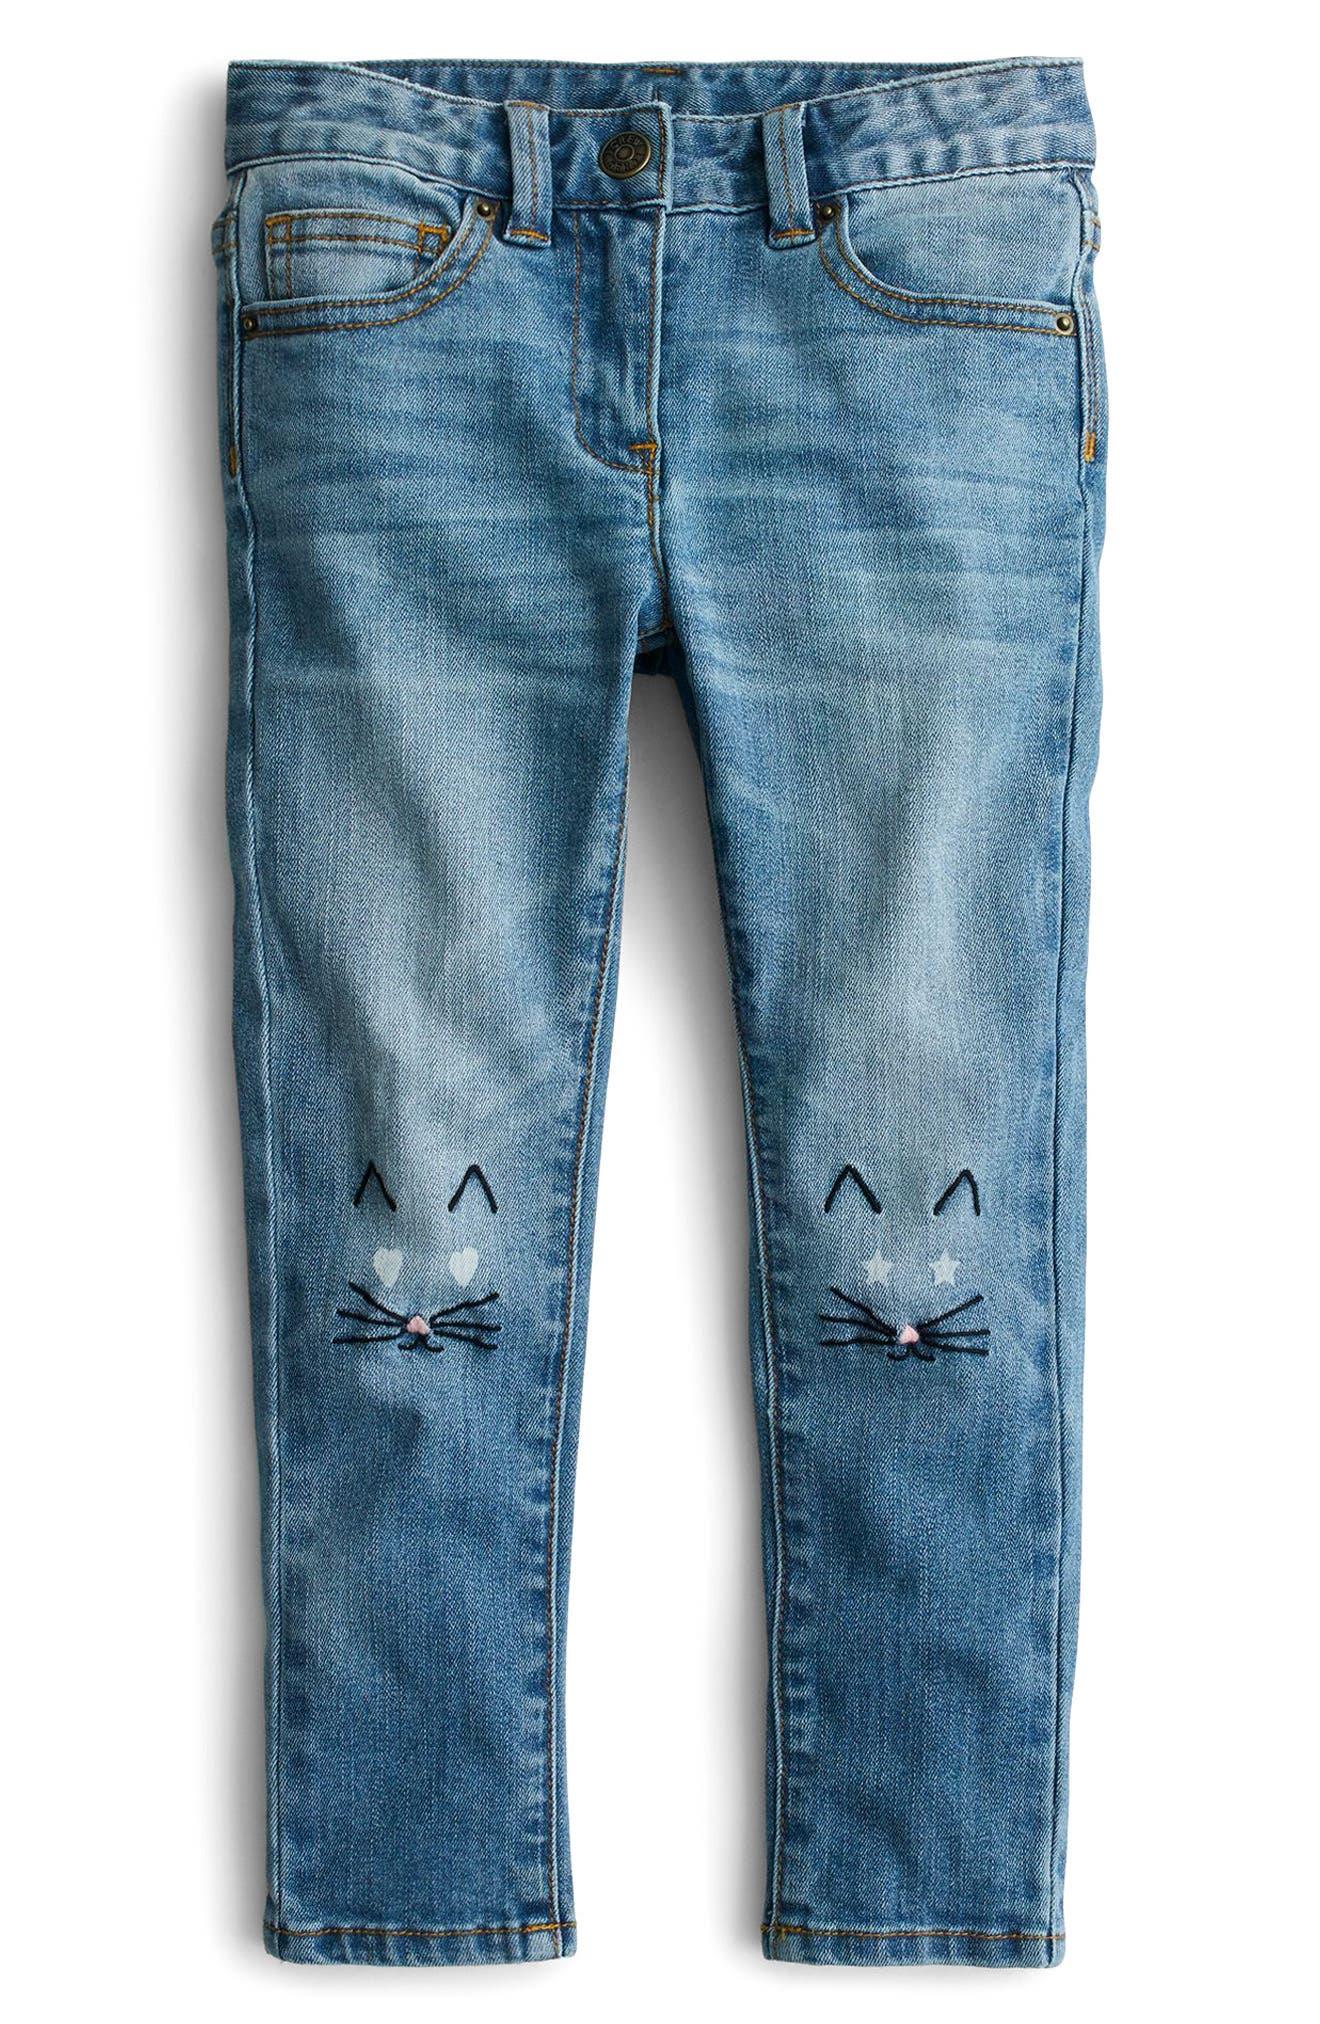 Toothpick Kitten Embroidered Jeans,                             Main thumbnail 1, color,                             Indigo